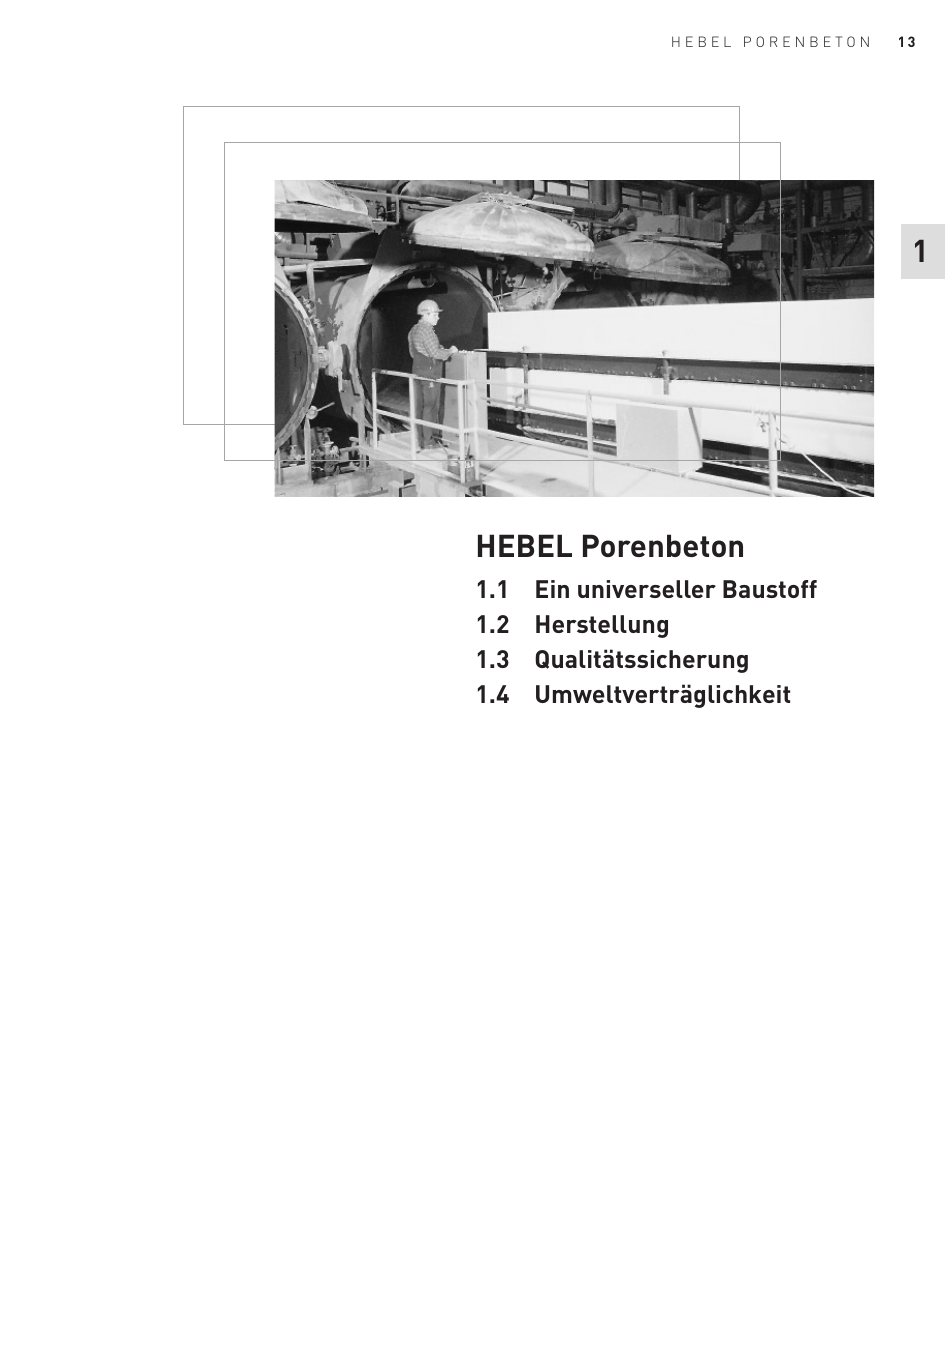 Niedlich Geschweißte Drahtgewebe Ideen - Elektrische Schaltplan ...